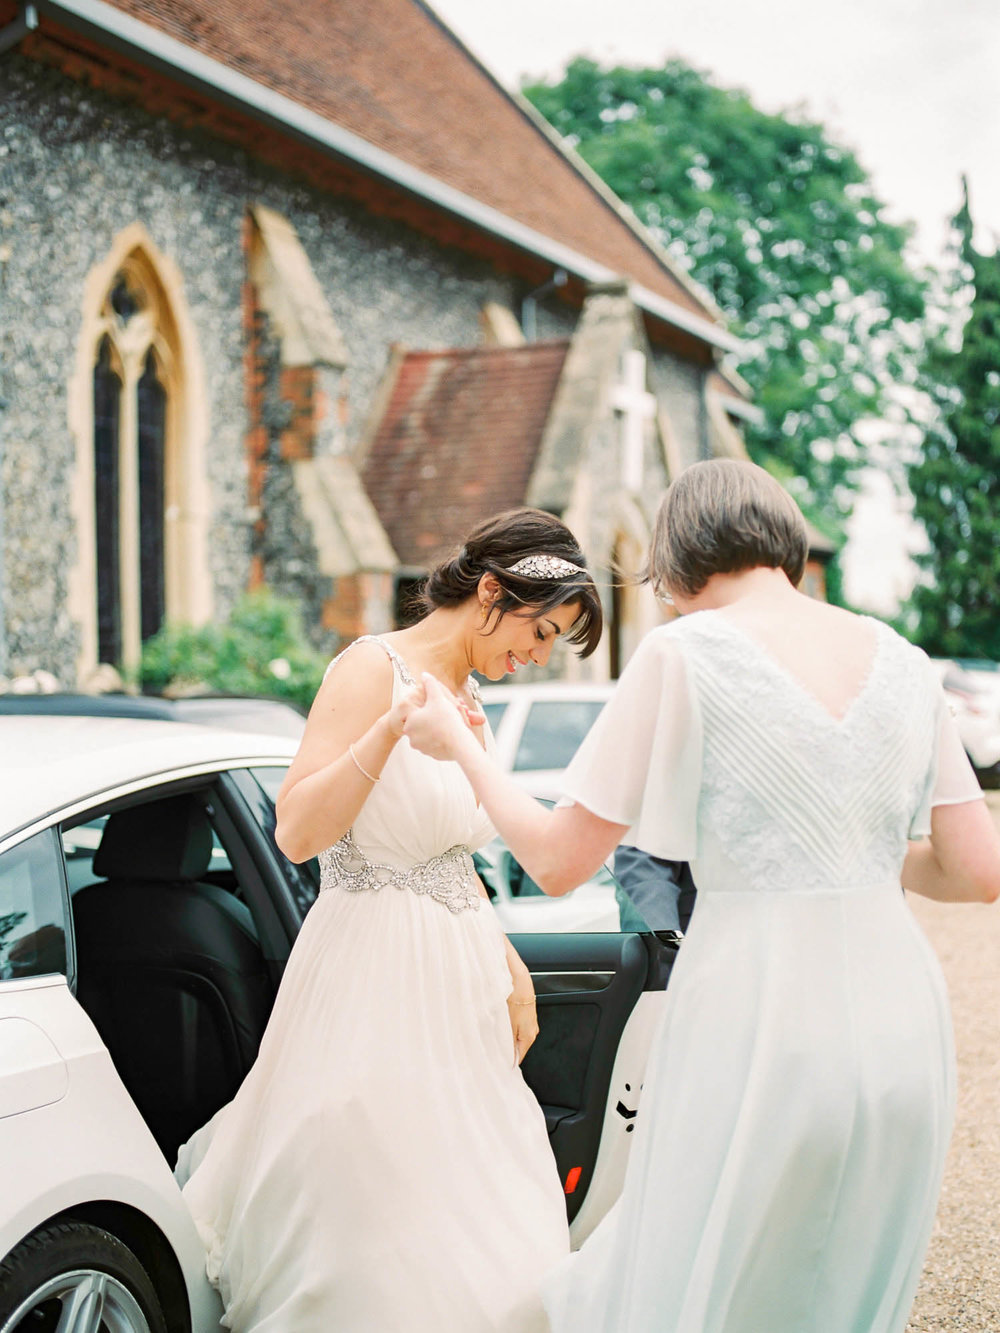 Amy O'Boyle Photography- Destination & UK Fine Art Film Wedding Photographer- Brickendonbury Estate Wedding-10.jpg